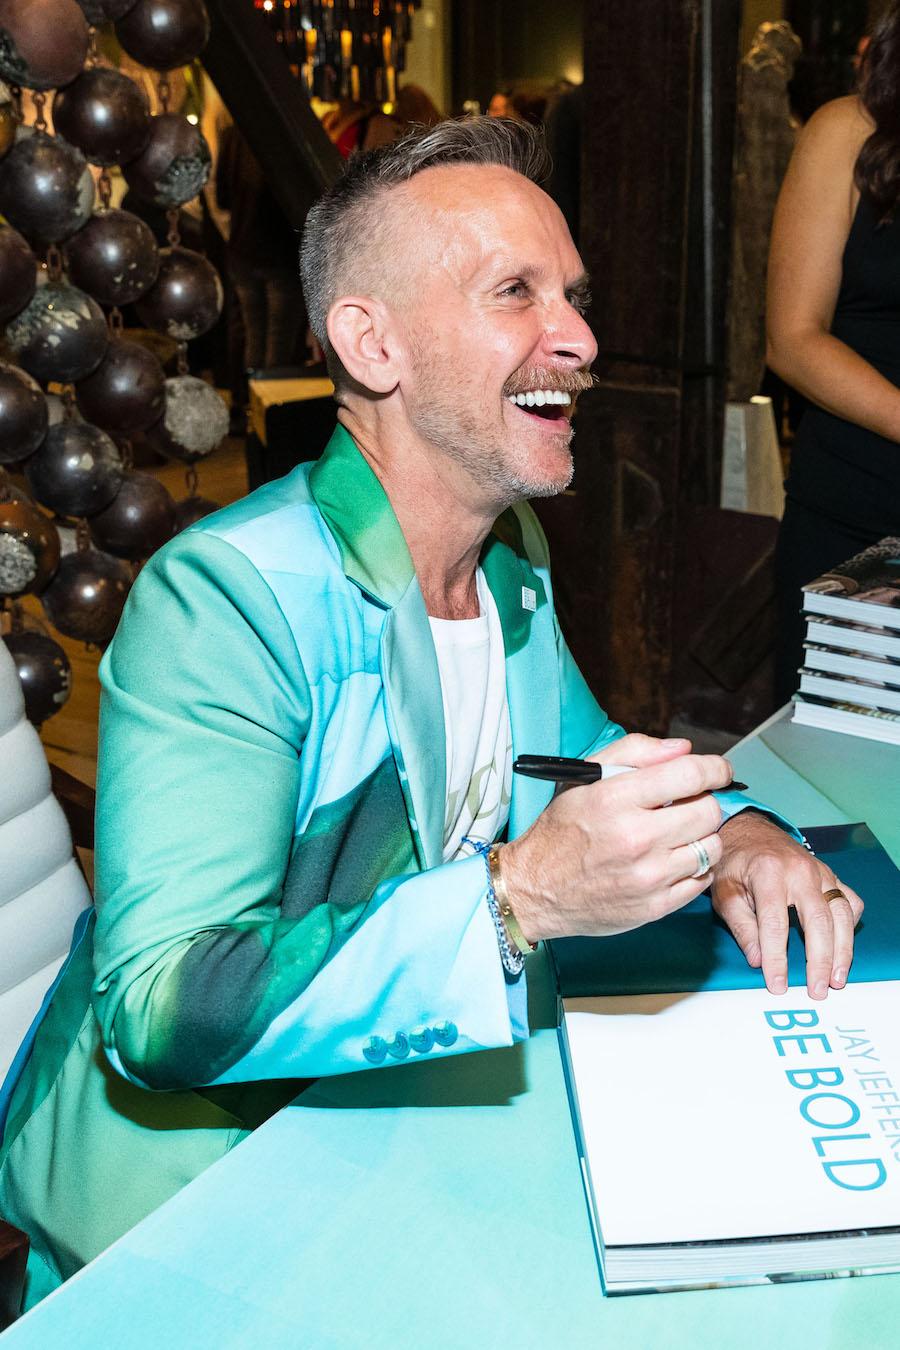 Jeffers signs books